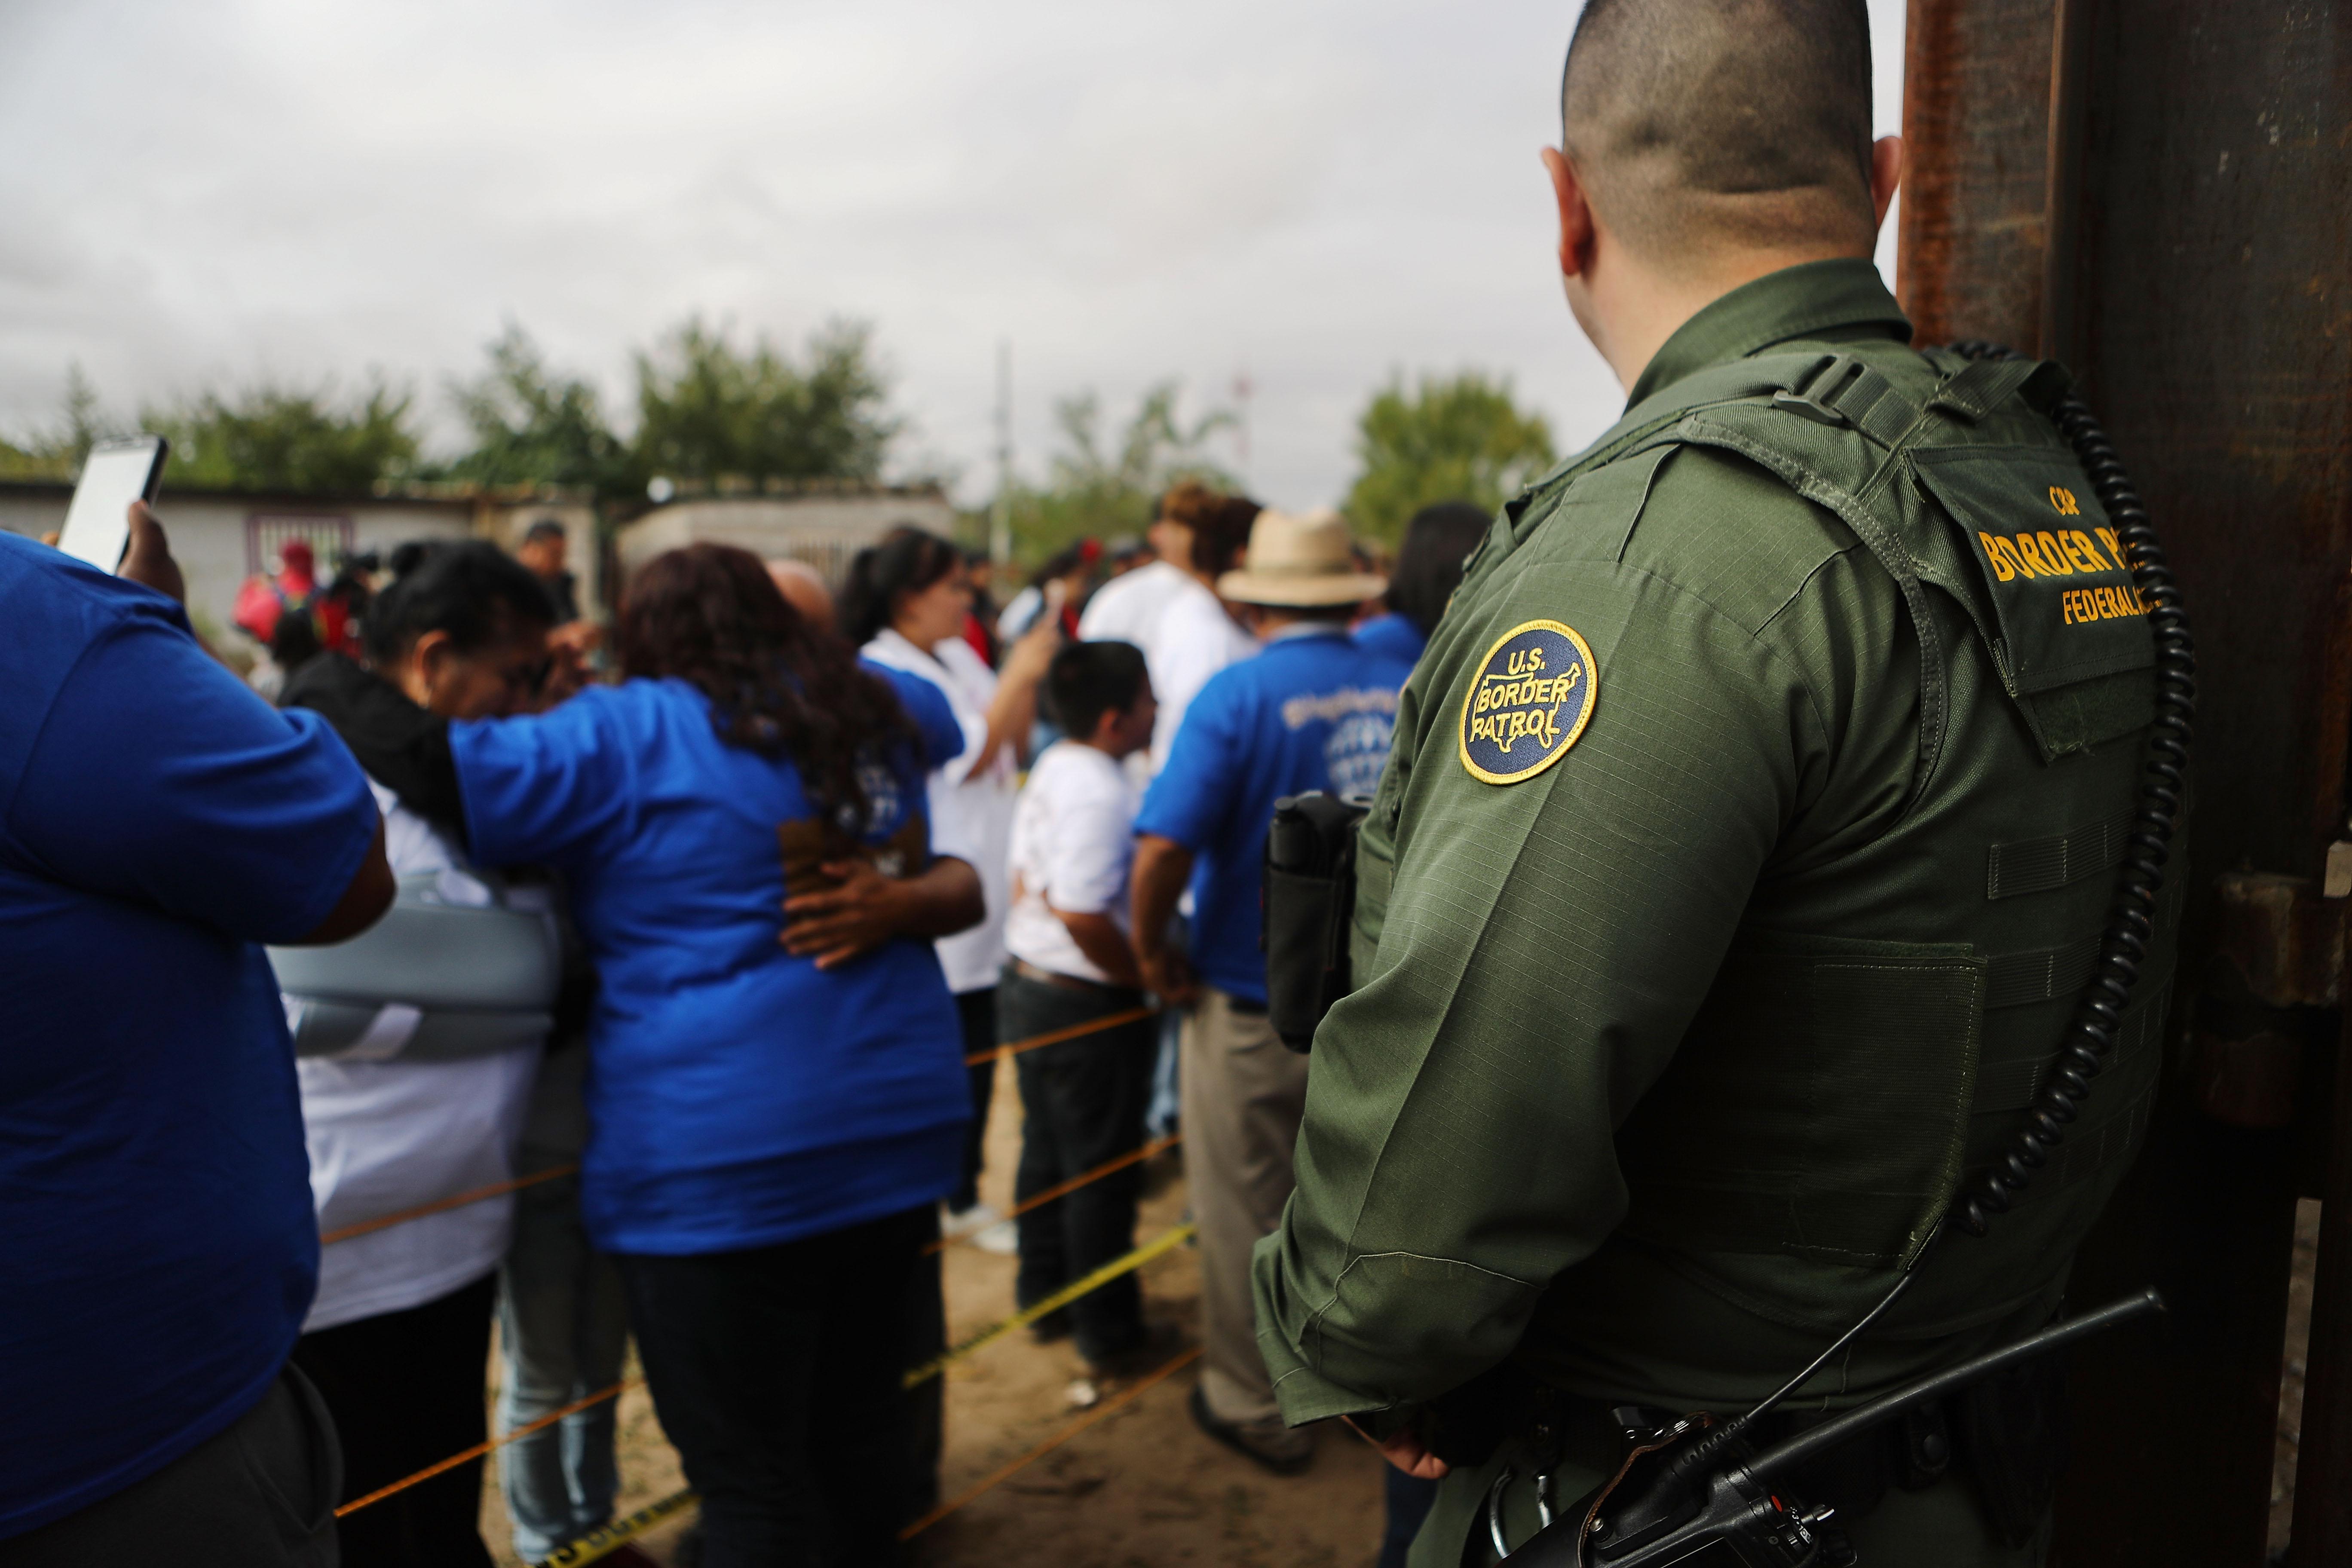 Hugs Not Walls Event Briefly Reunites Families At US-Mexico Border Wall